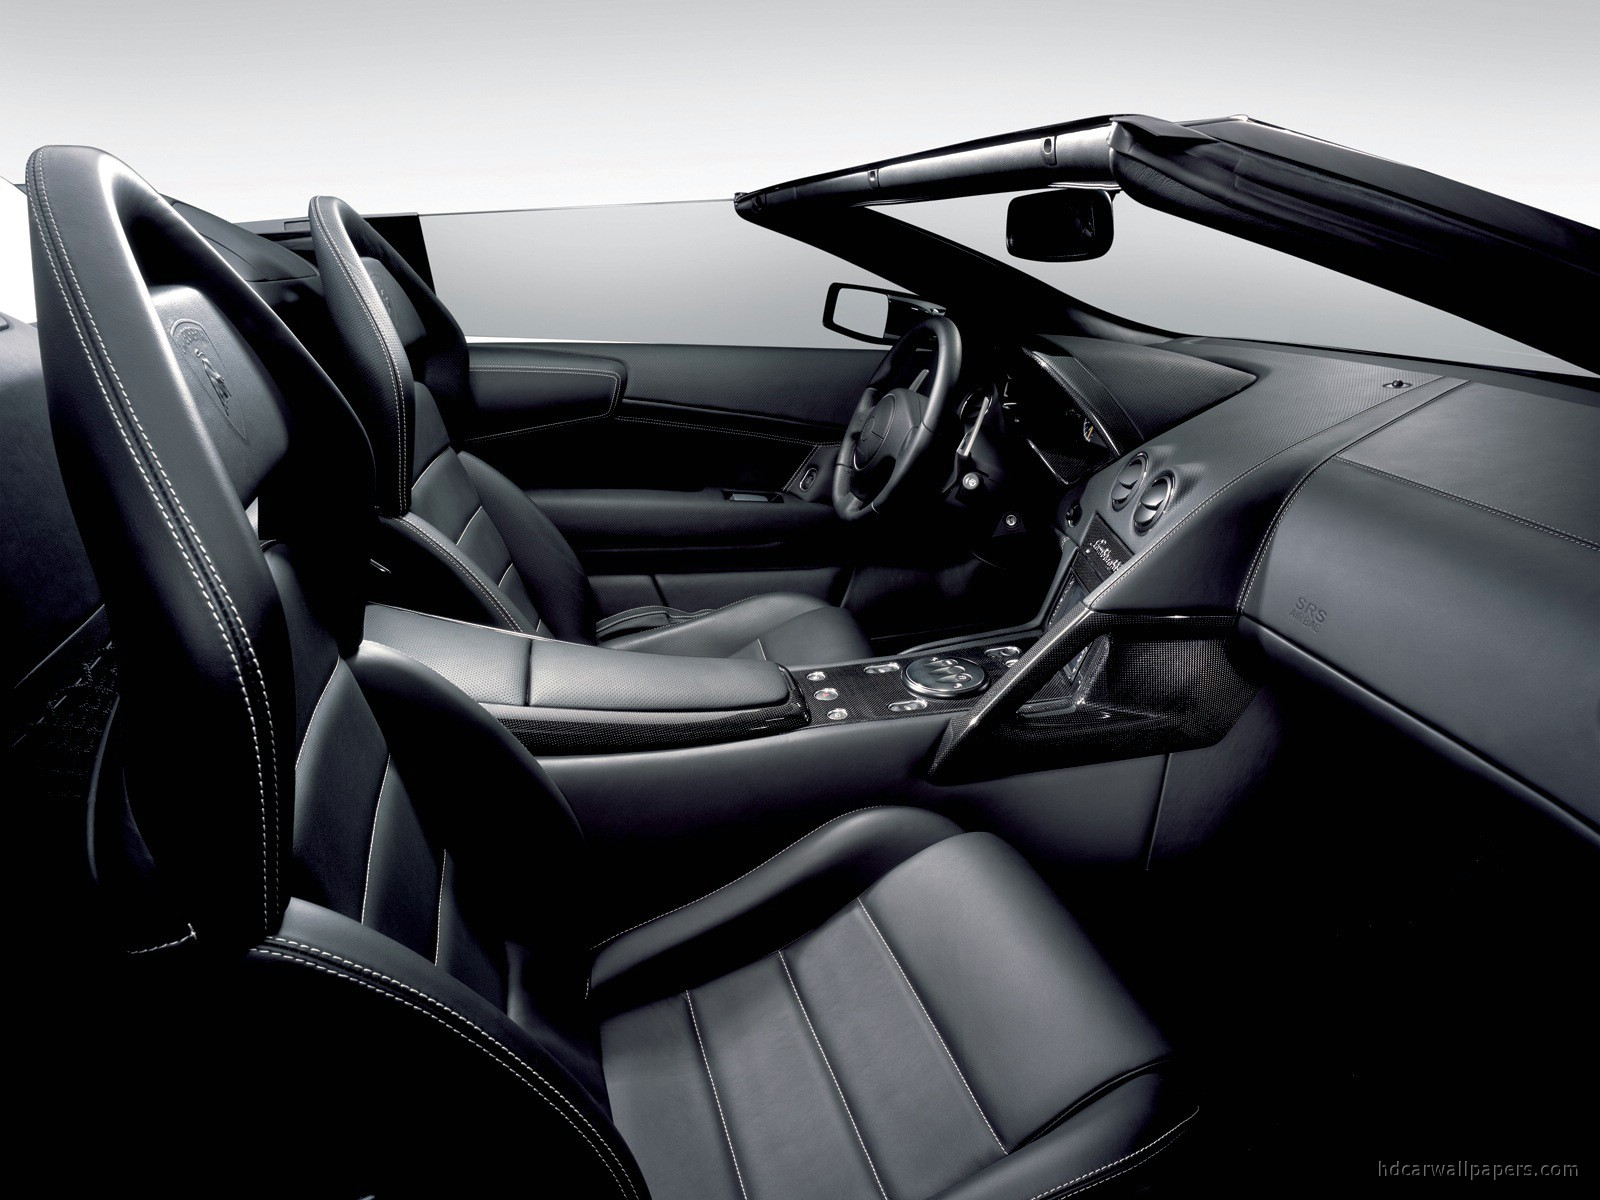 Lamborghini Murcielago Lp640 Roadster Interior Wallpaper Hd Car